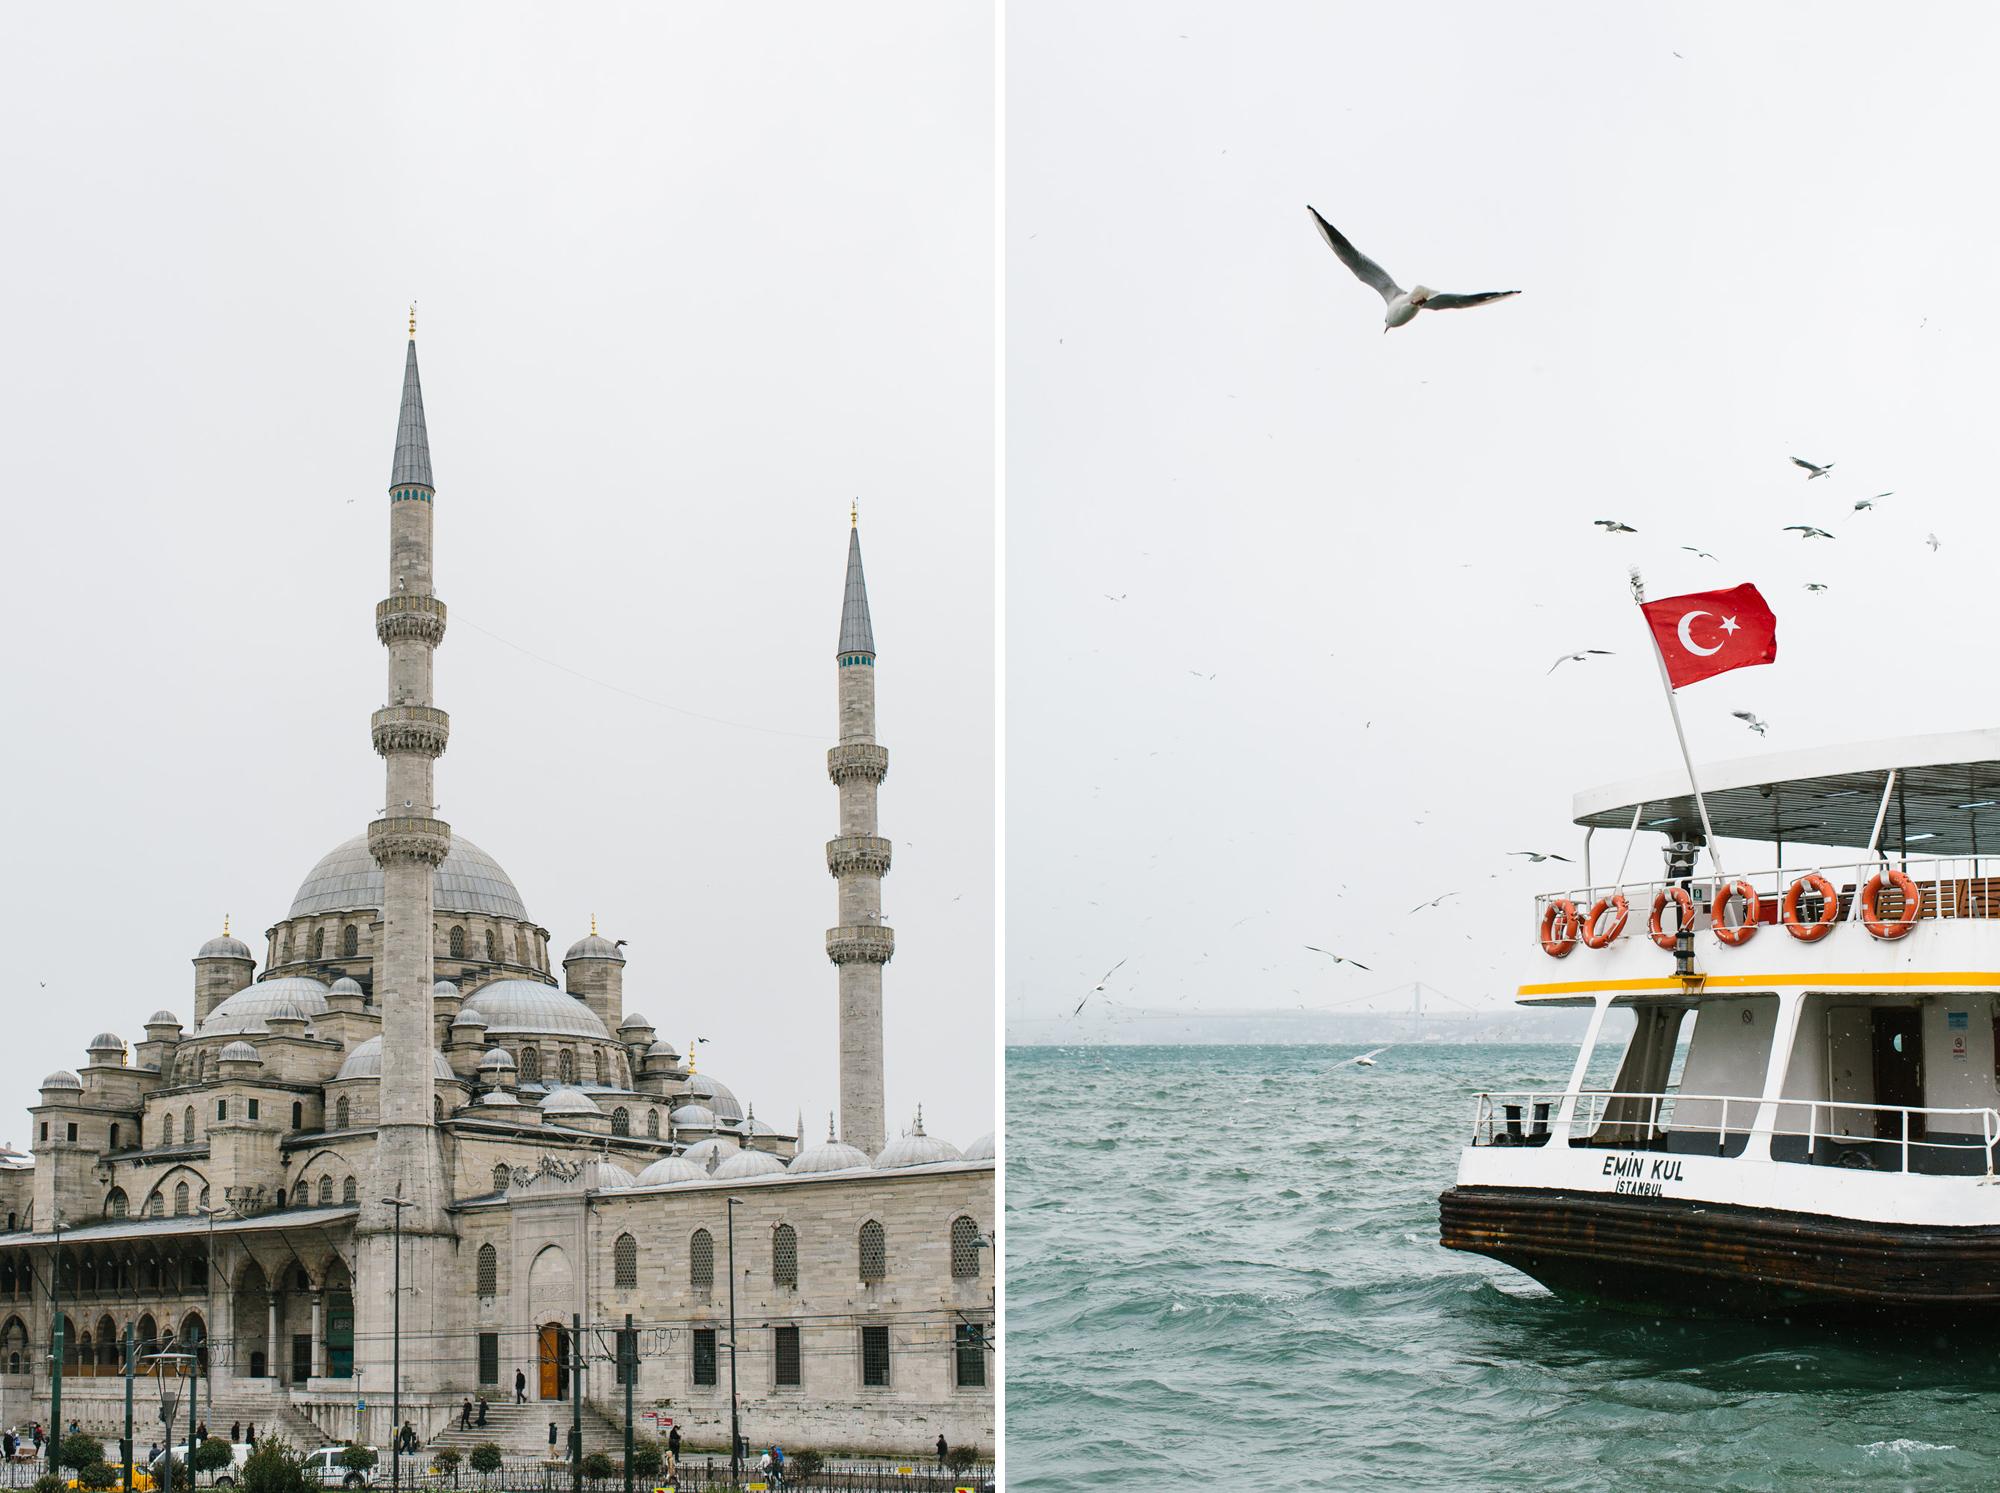 Istanbul_Bosphorus-AudiMagazine-FinnBeales-04.jpg